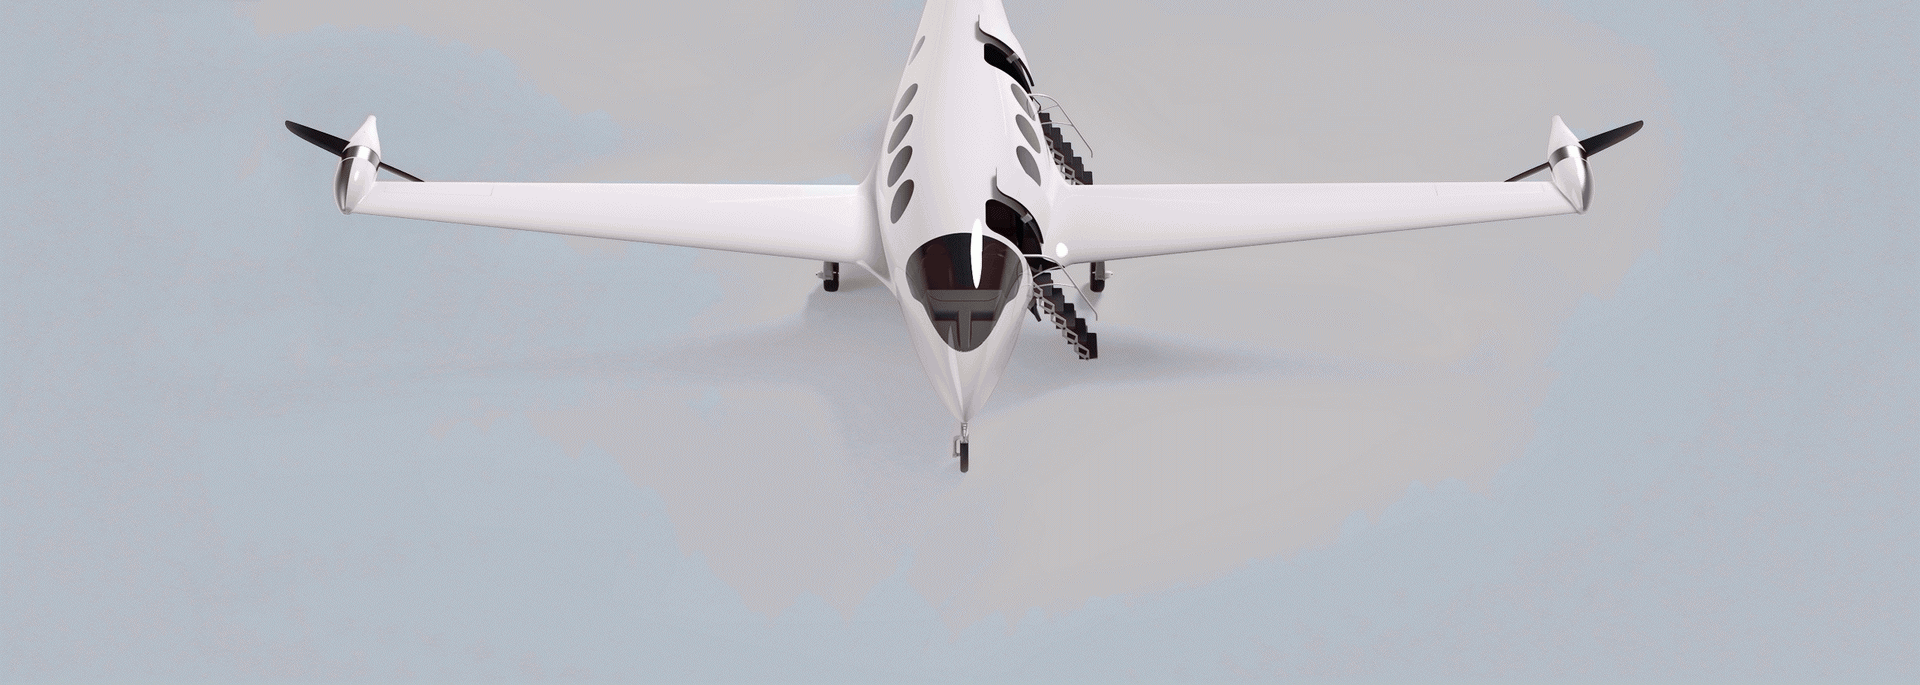 Электрический воздушный борт Alice